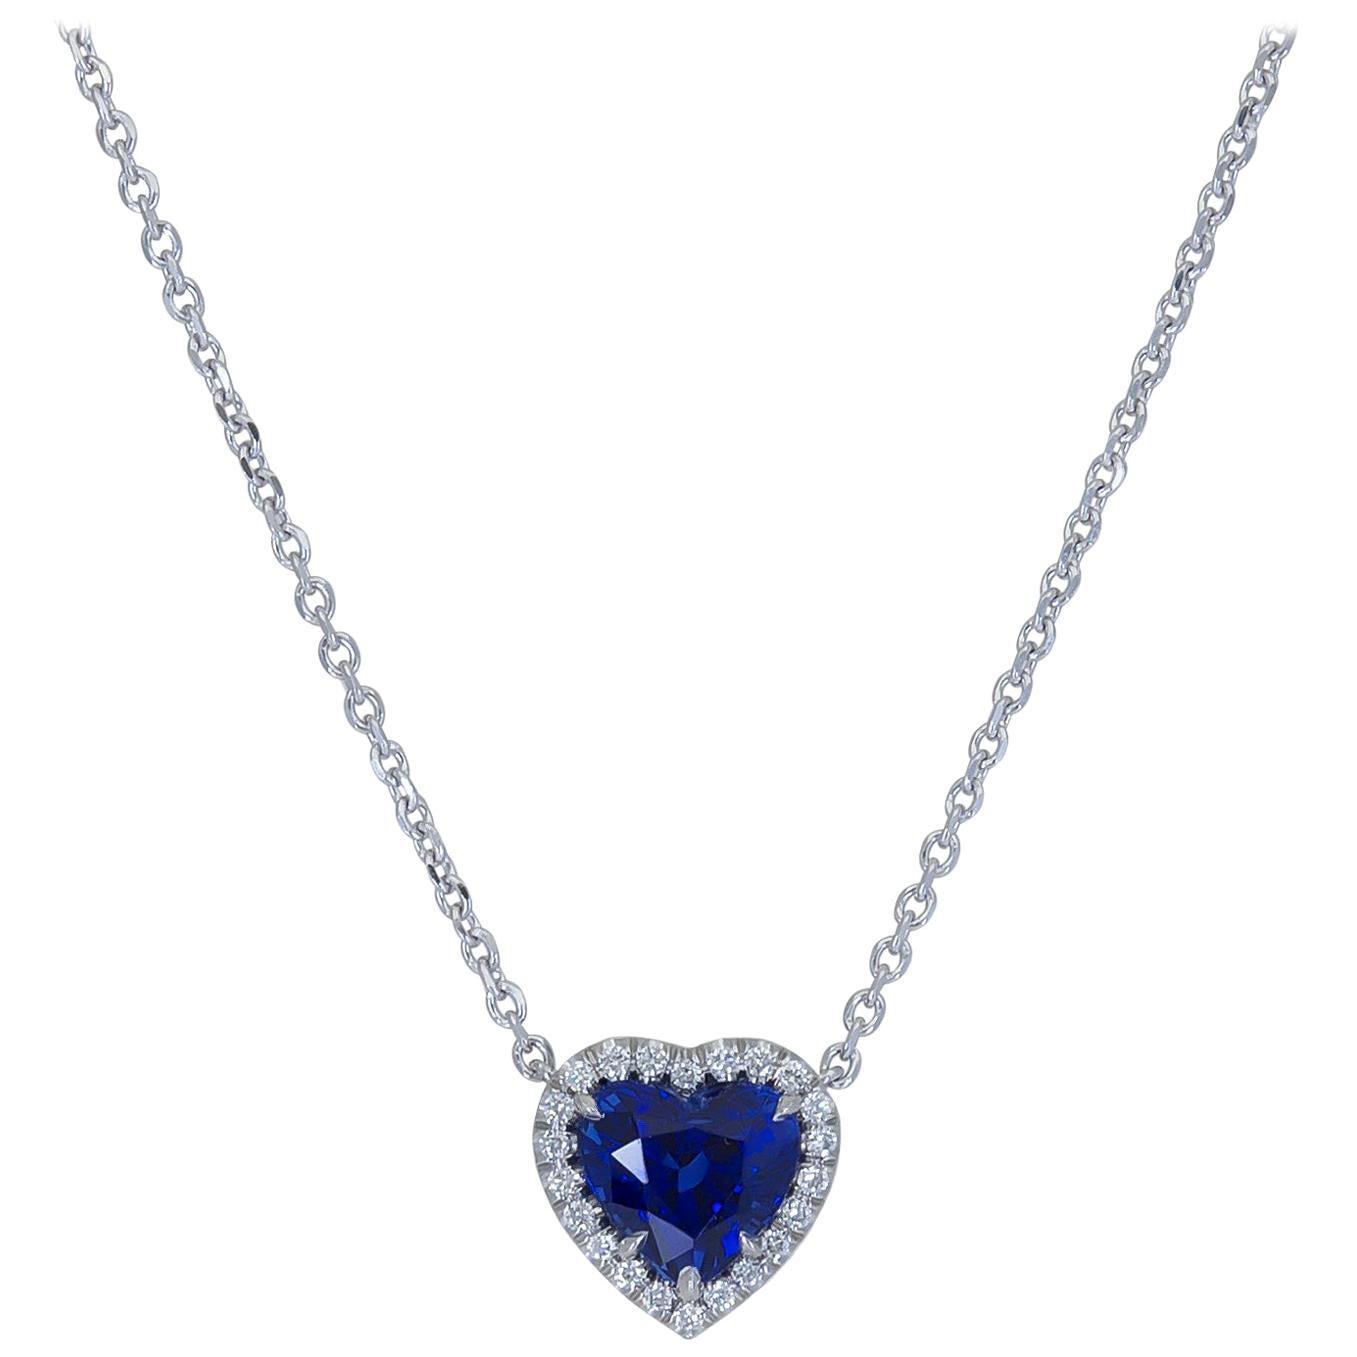 C. Dunaigre Heart Shape Blue Sapphire and Diamond Halo Pendant Necklace